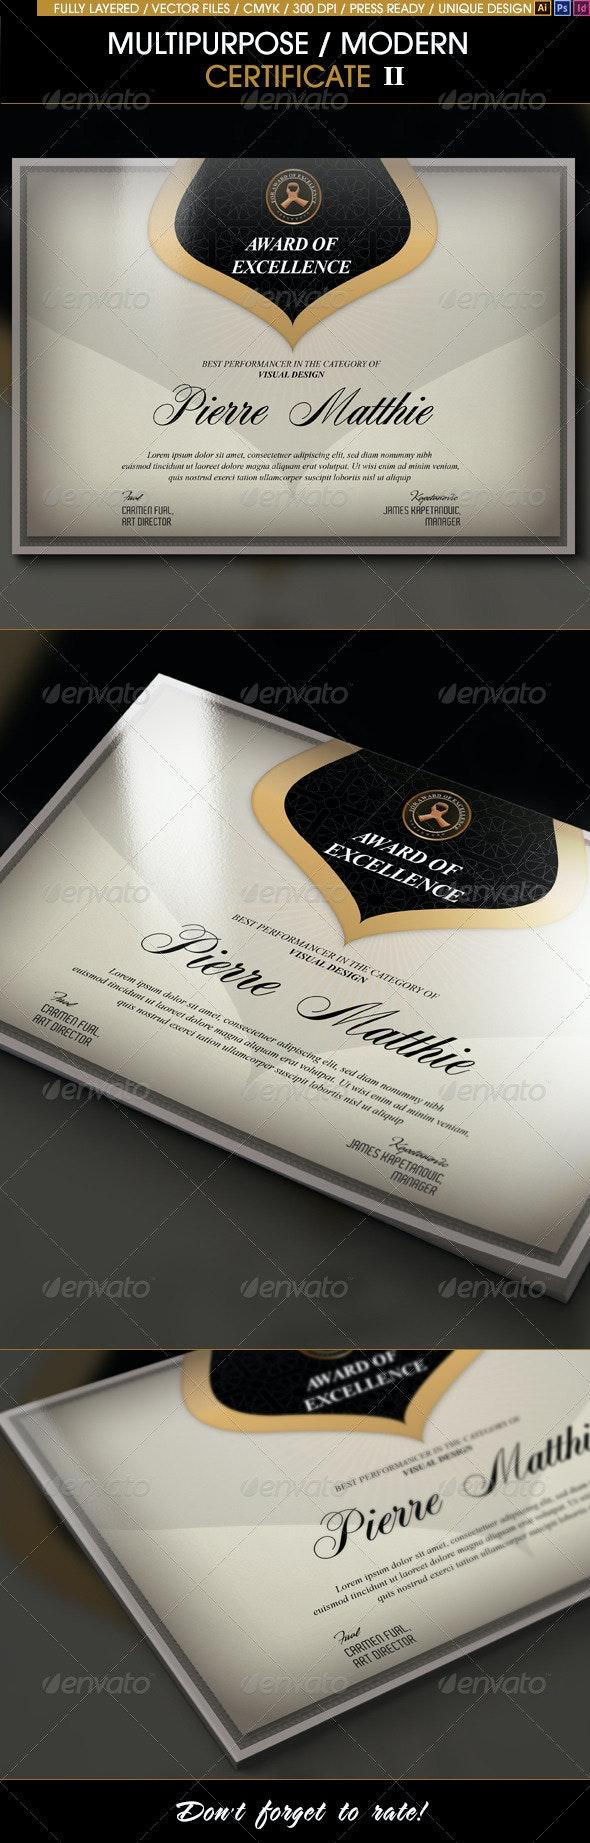 Multipurpose Modern Certificate v.2 (All Formats) - Certificates Stationery